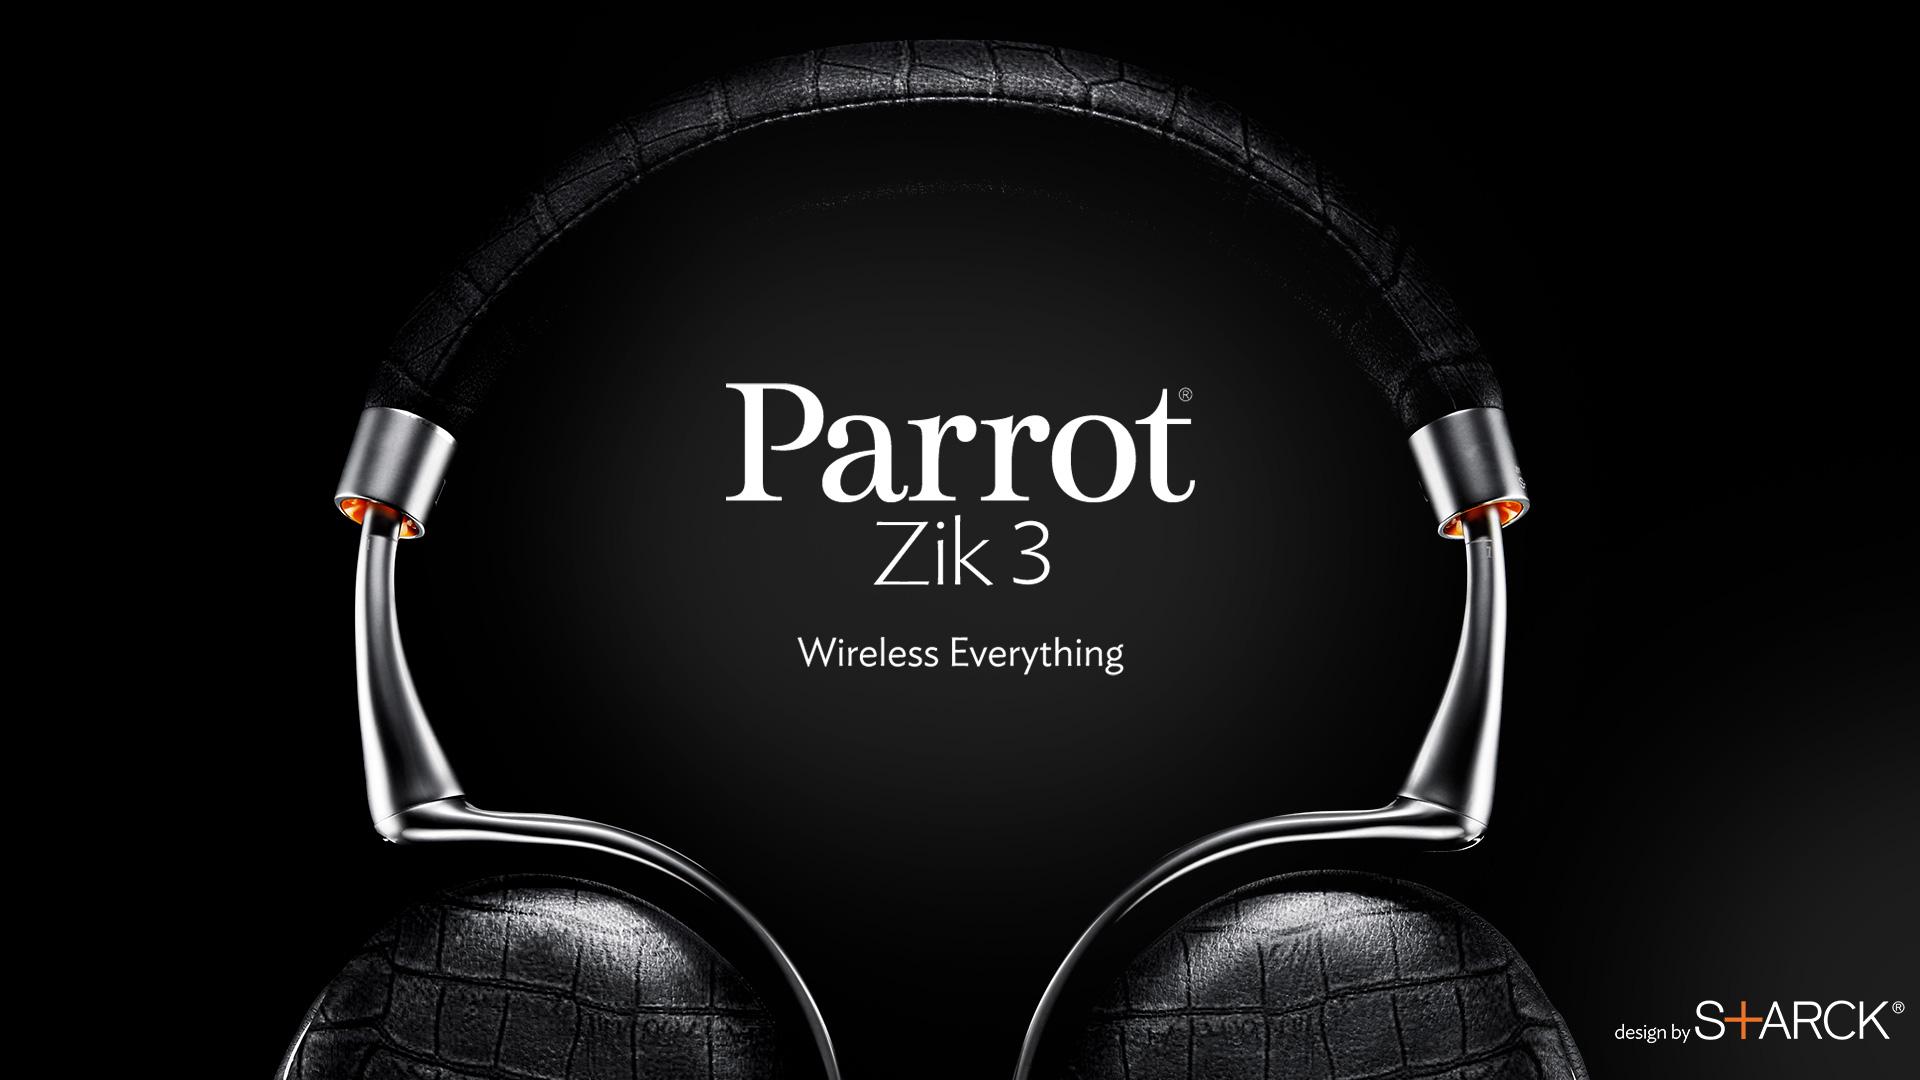 Parrot Zik 3: Kabellose Kopfhörer mit Smart Touch Control